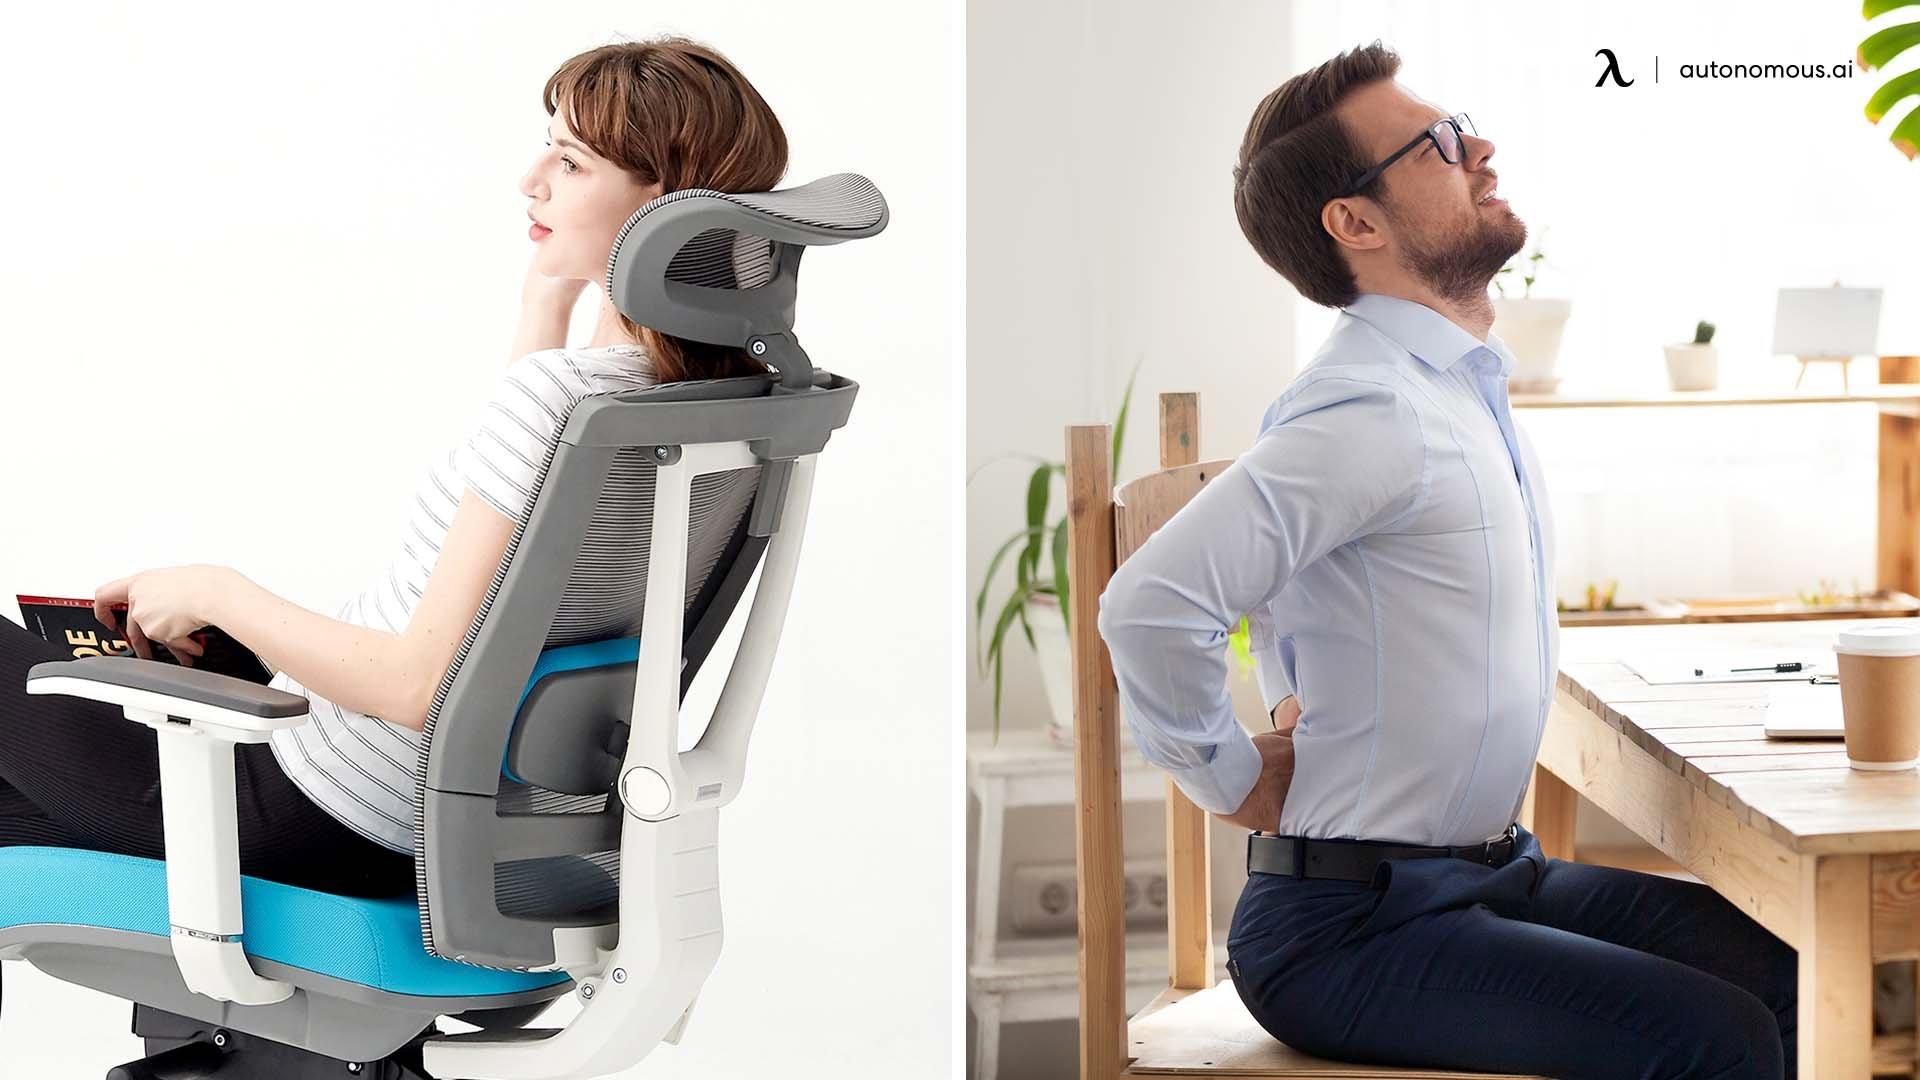 Ergonomic Chair Vs Office Chair: The Comparison